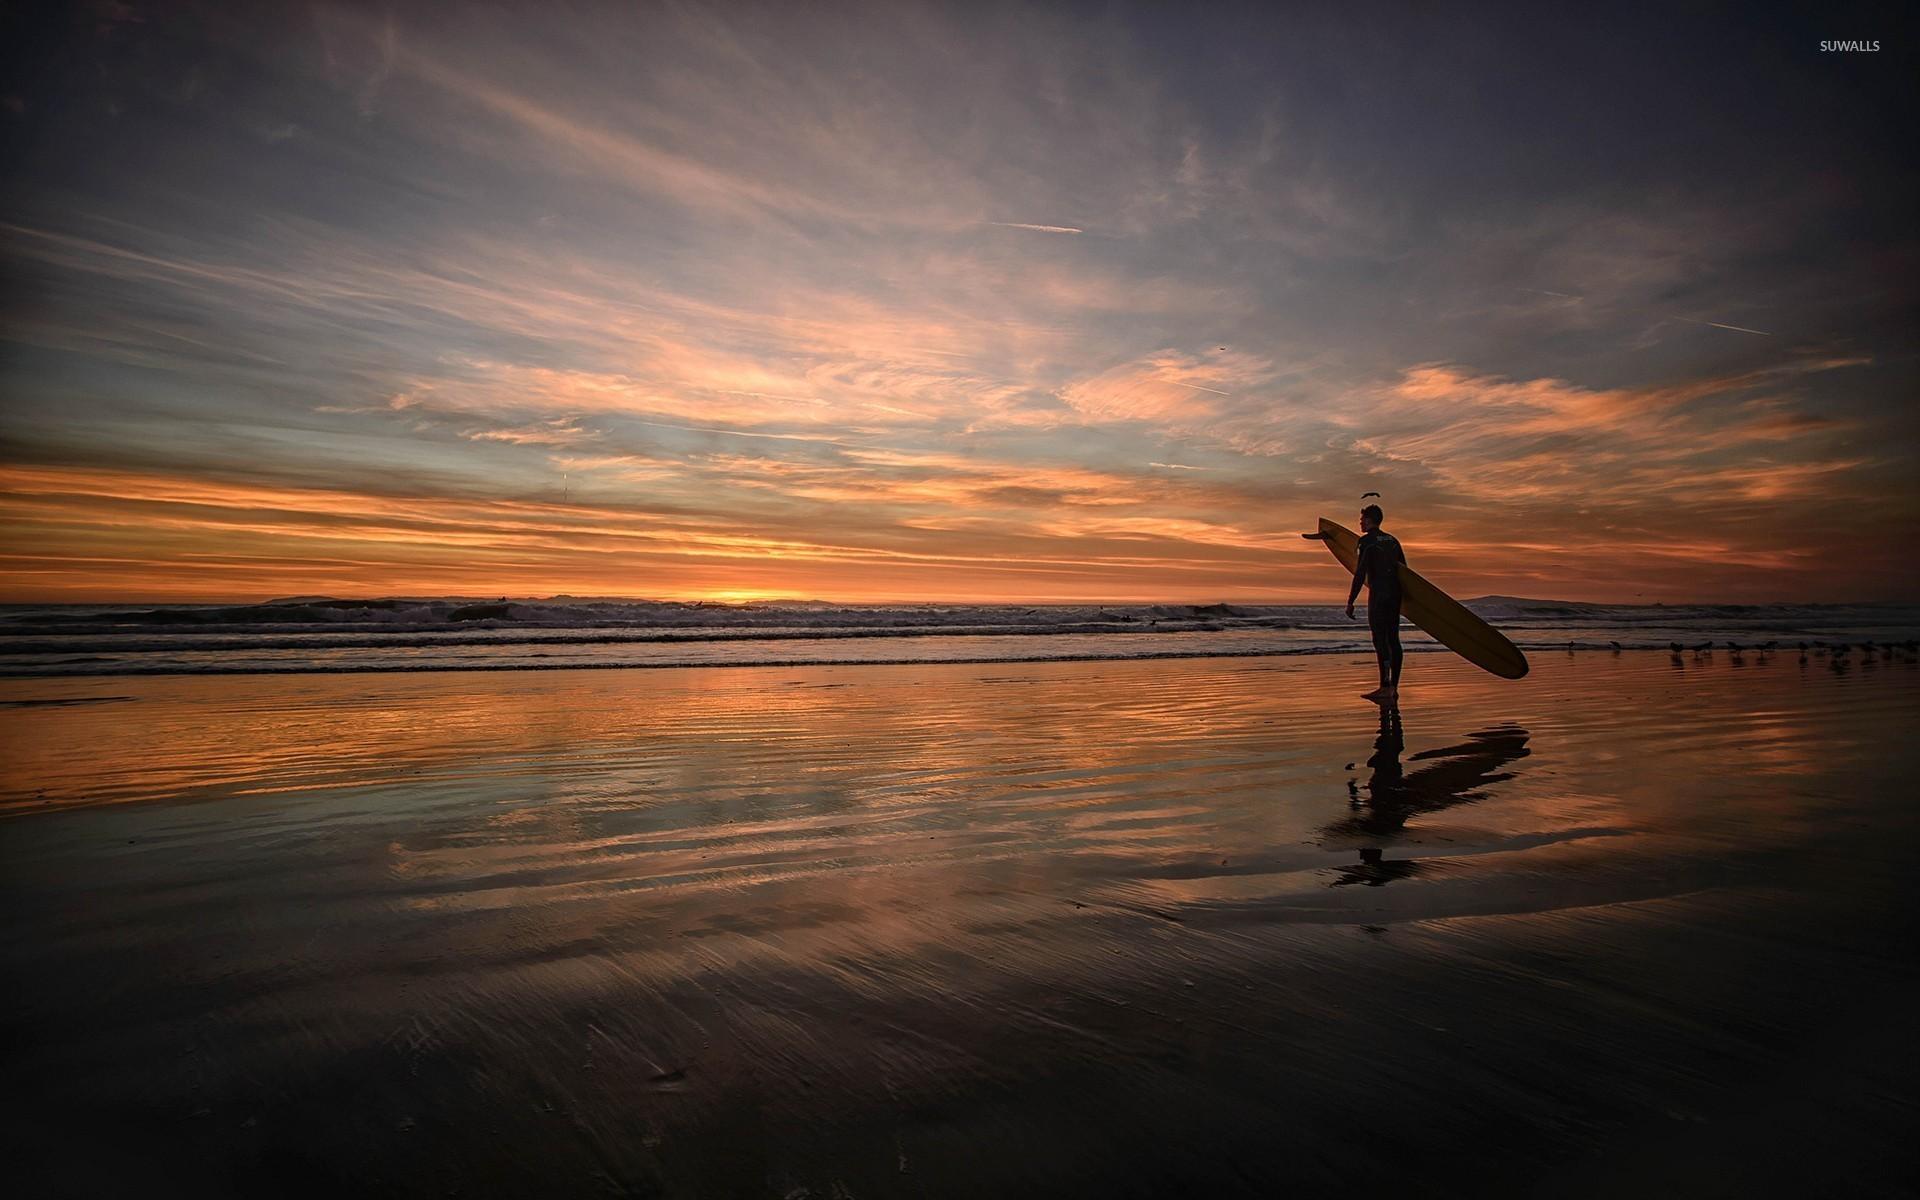 Surfing At Sunset Wallpaper